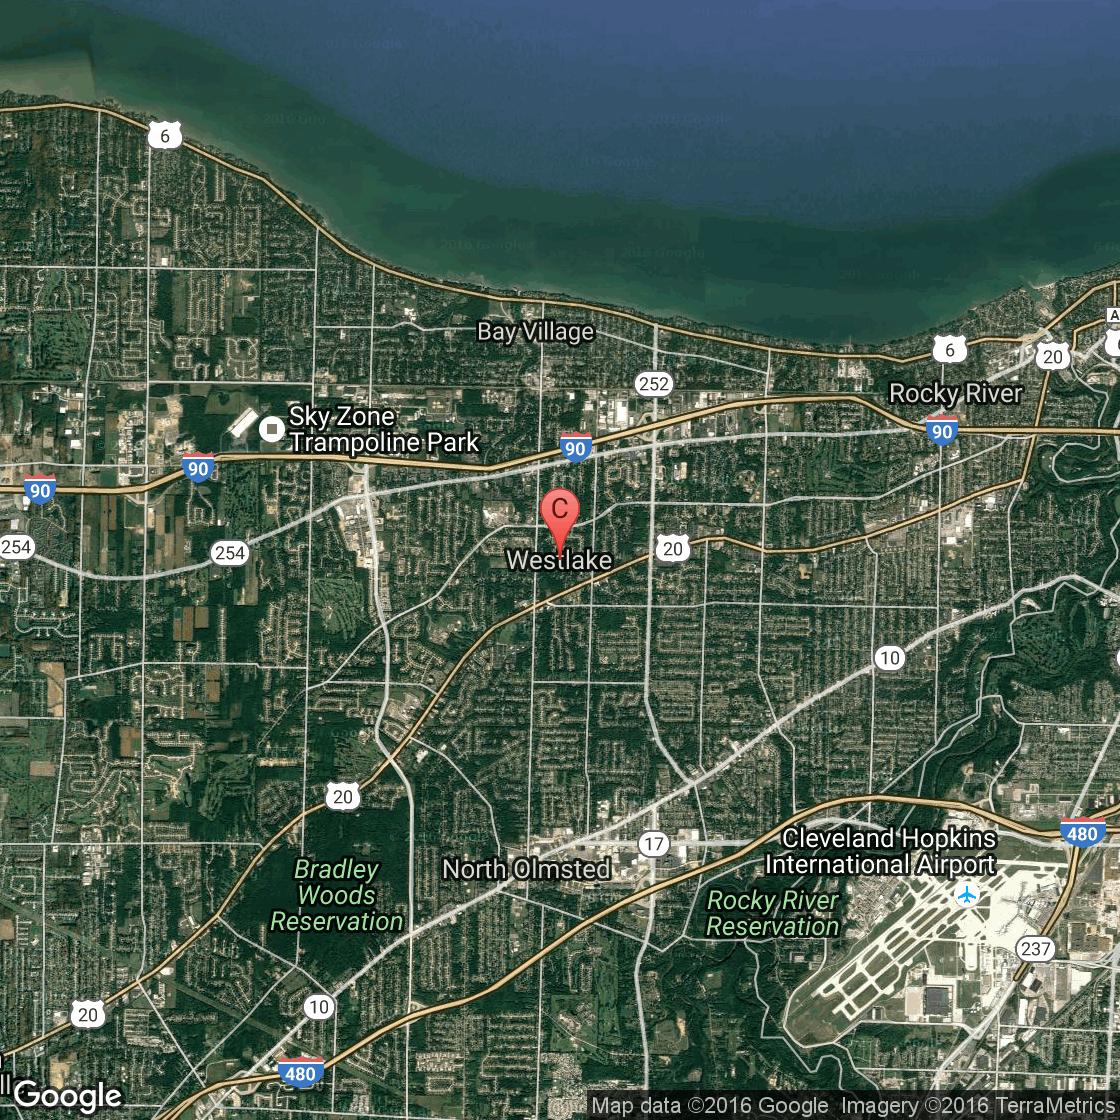 Westlake Apartments: Attractions In Crocker Park In Westlake, Ohio